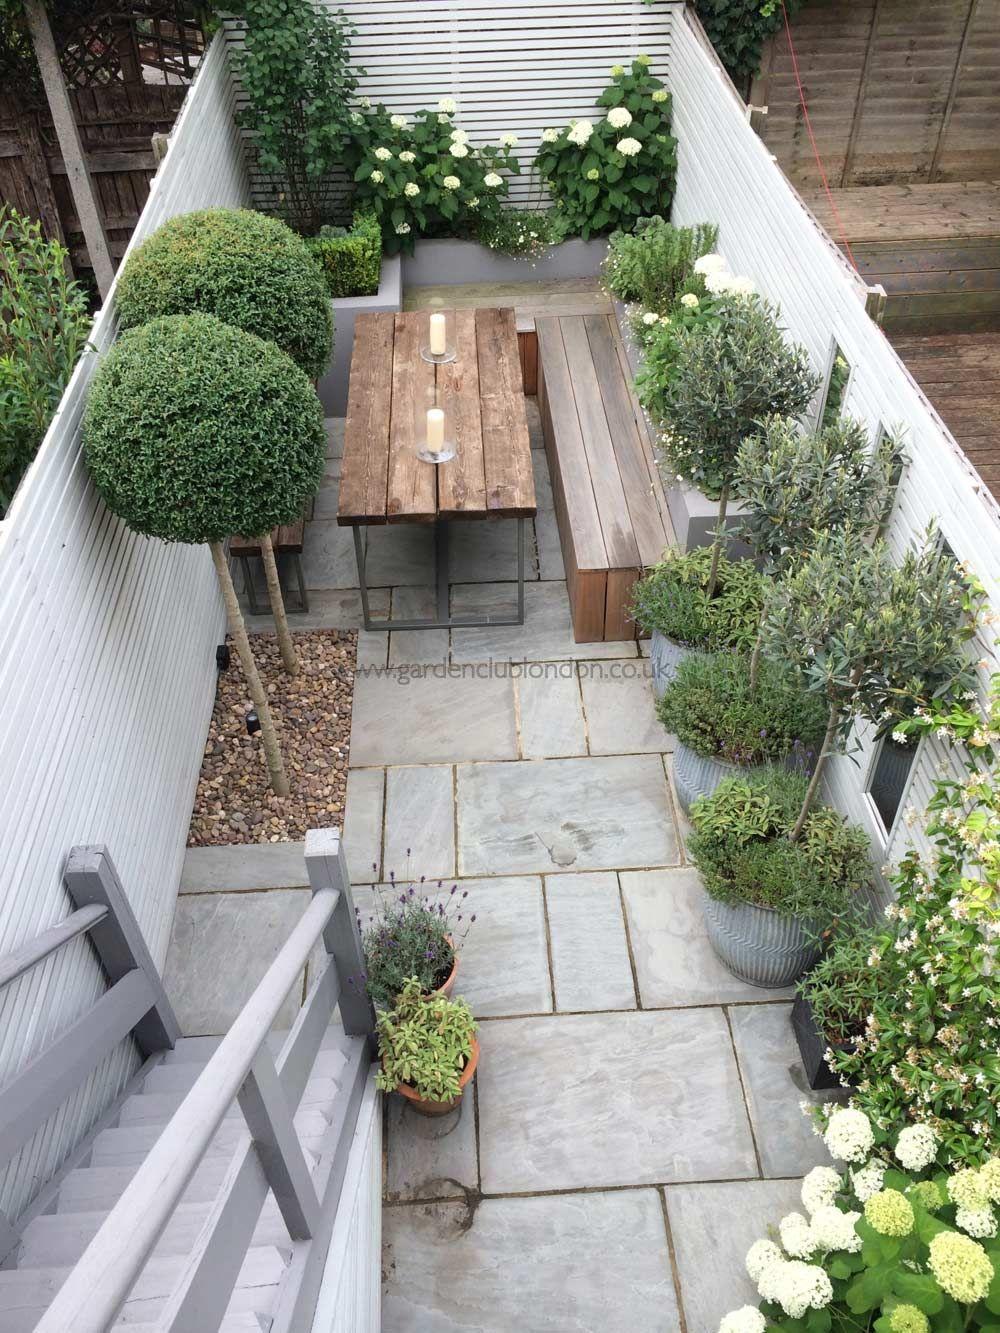 Refresh your home by grabbing small garden ideas